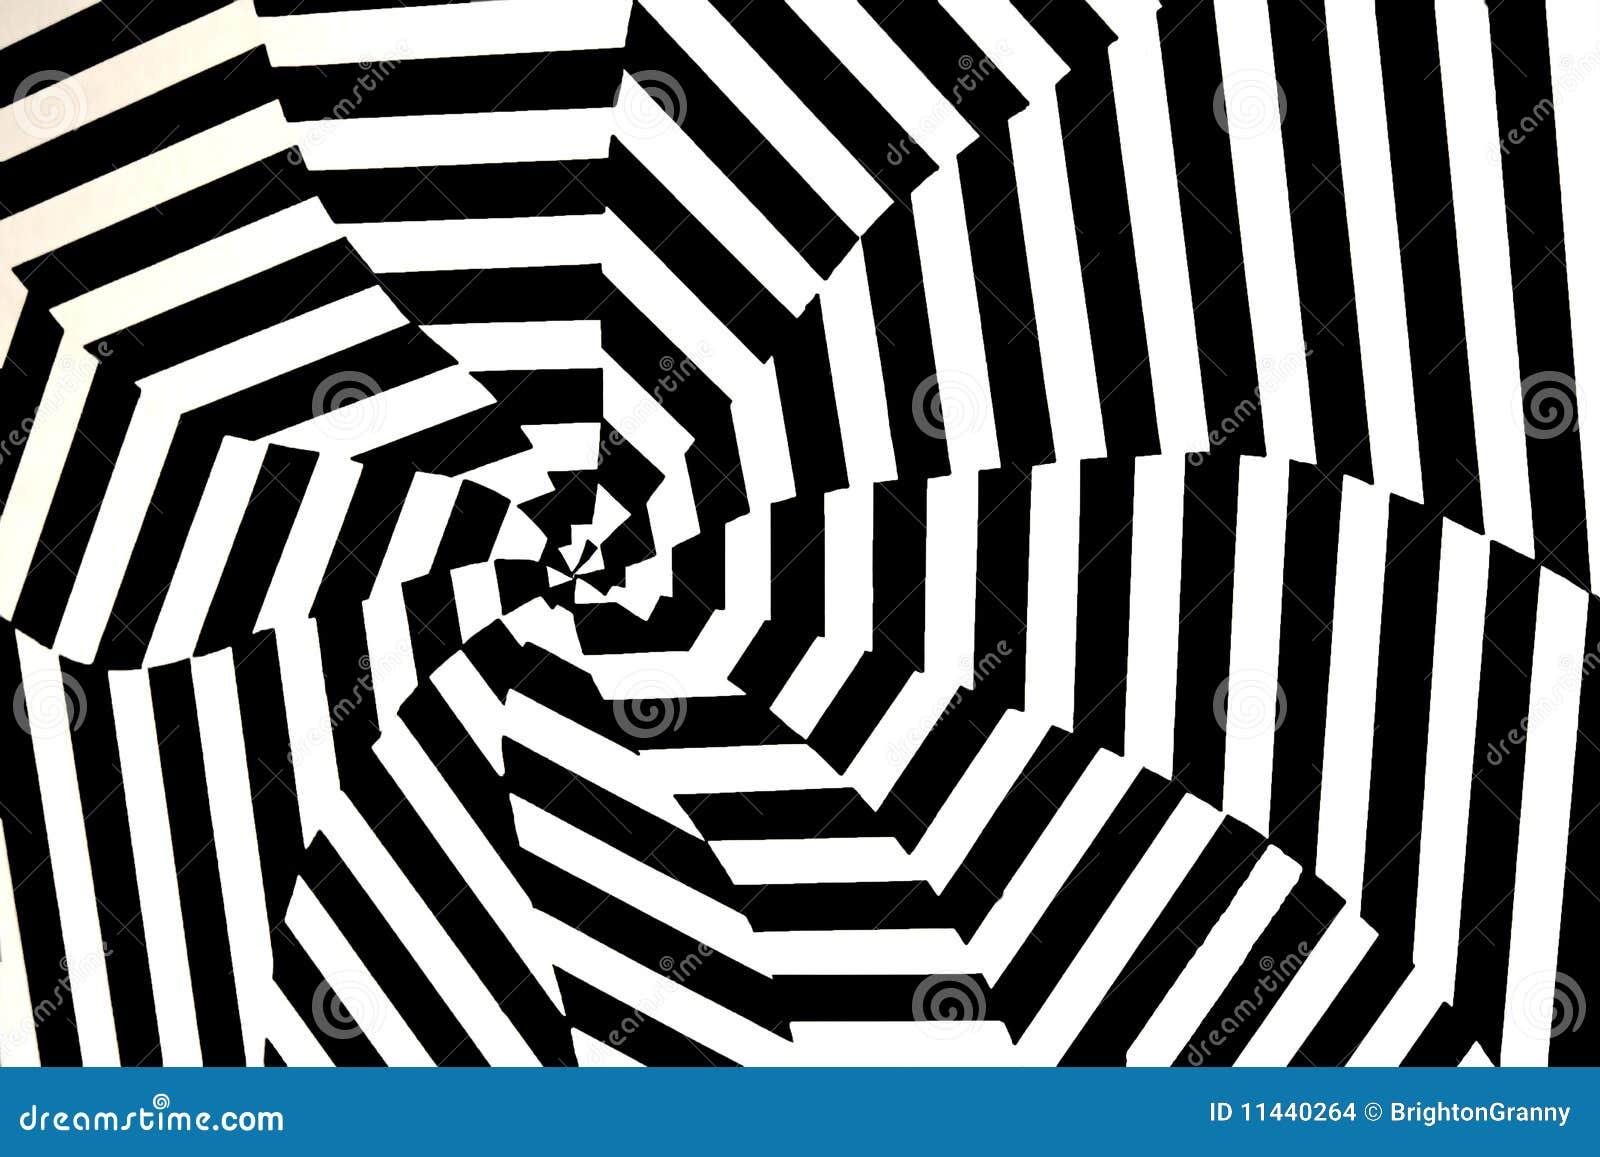 cuadroóptico11440264.jpg (1300×957) Arte